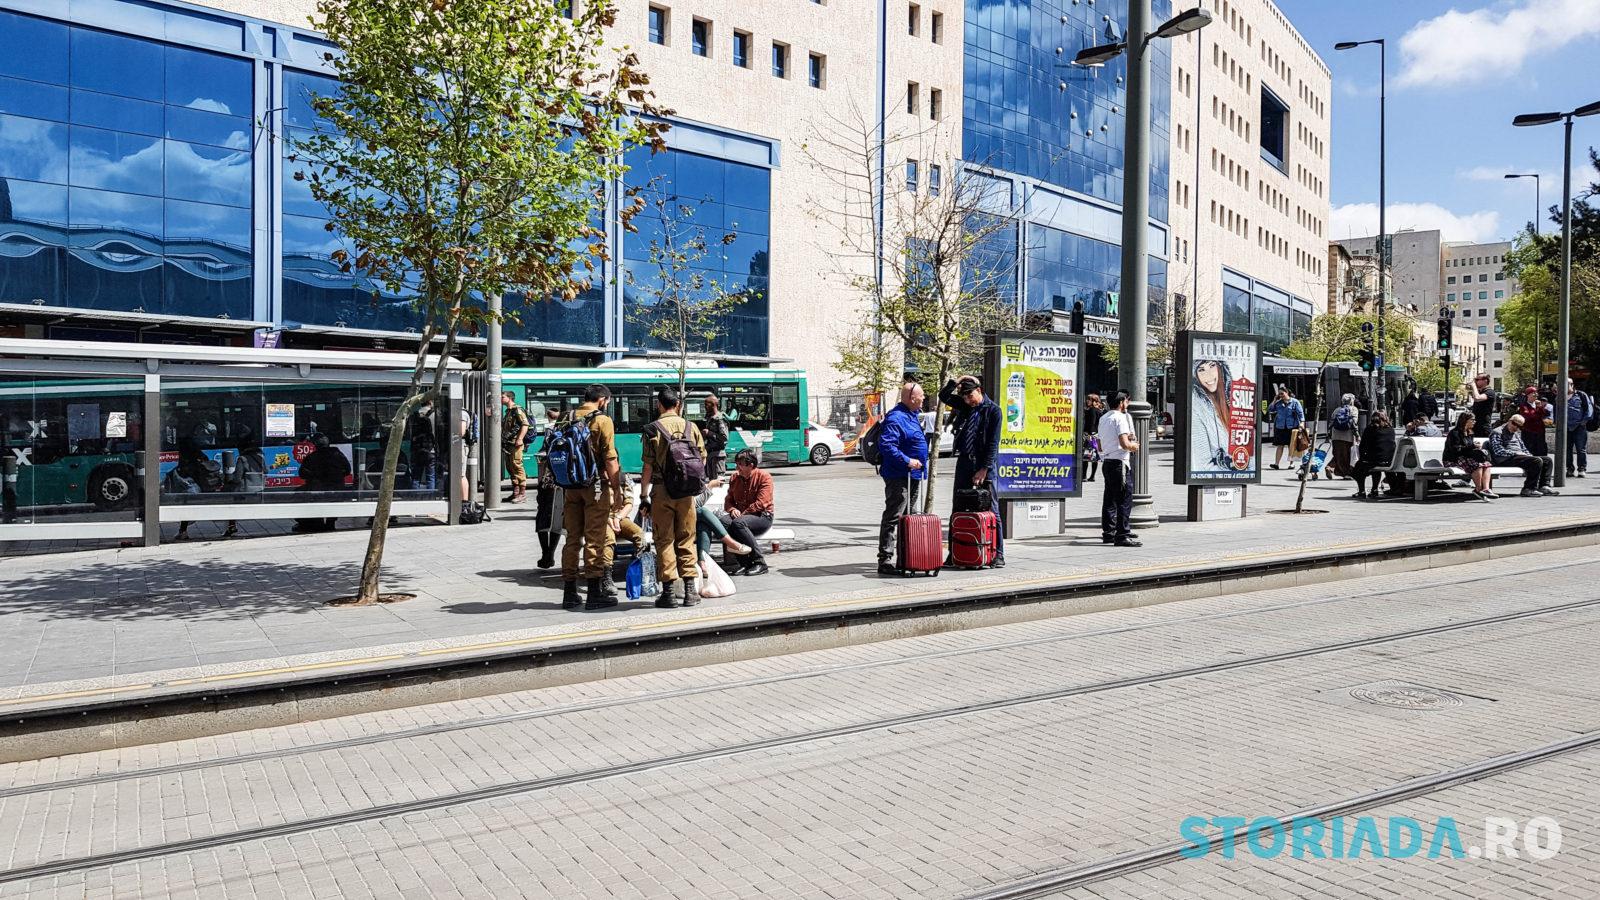 Jerusalem Central Bus Station, Itinerar calatorie Ierusalim